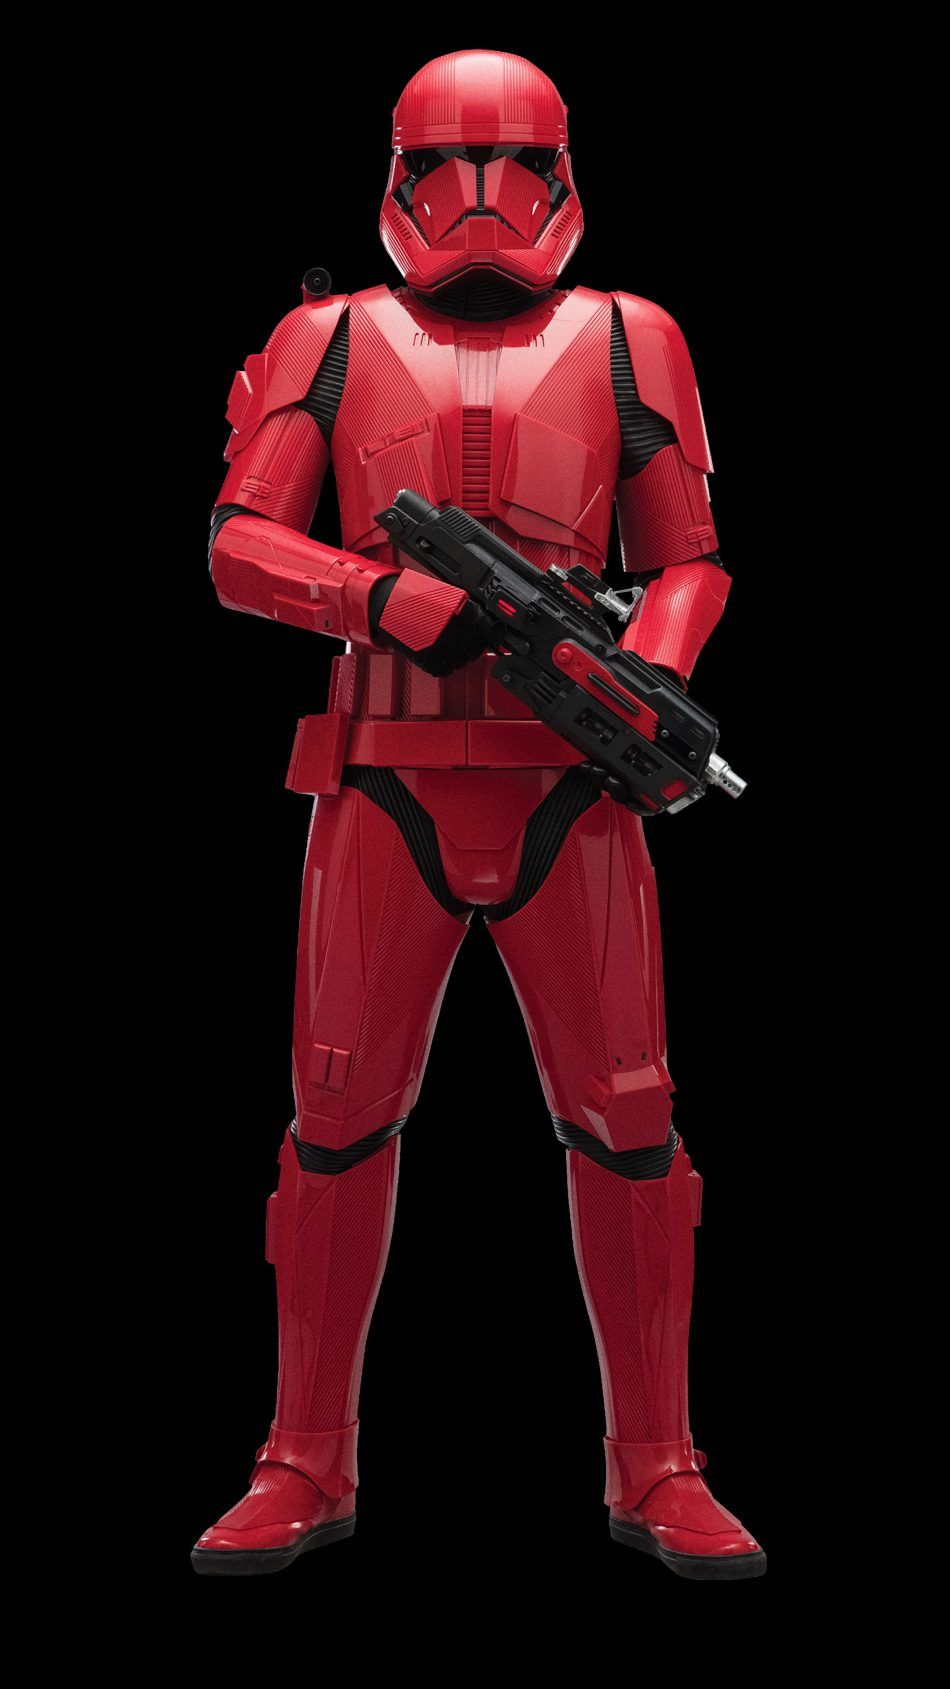 Sith Trooper Star Wars The Rise of Skywalker 2019 Star